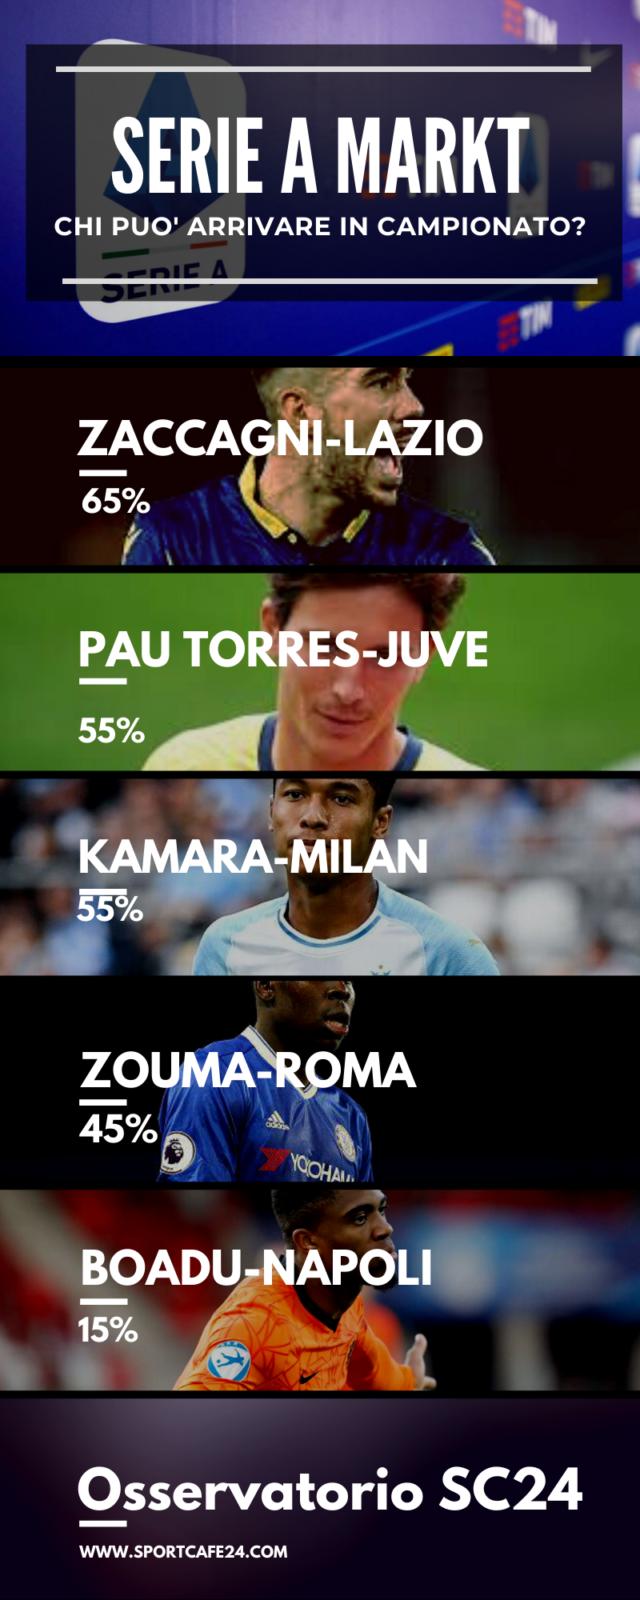 La Juventus ha messo Pau Torres nel mirino